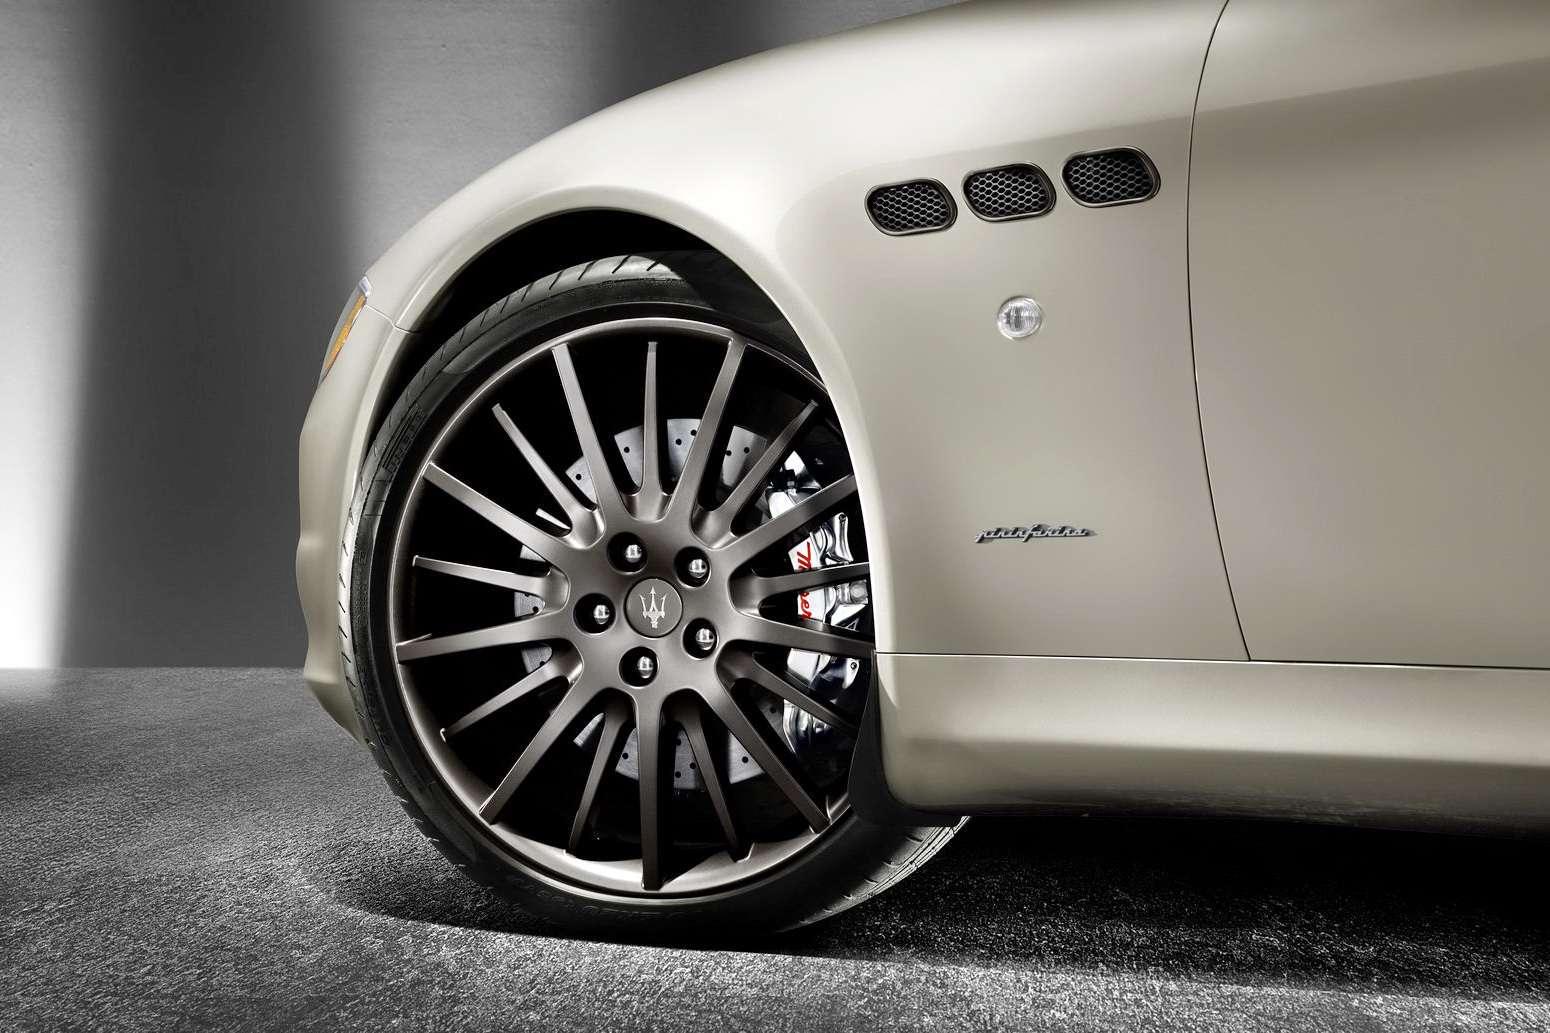 Maserati Quattroporte Sport GT S Awards luty 2010